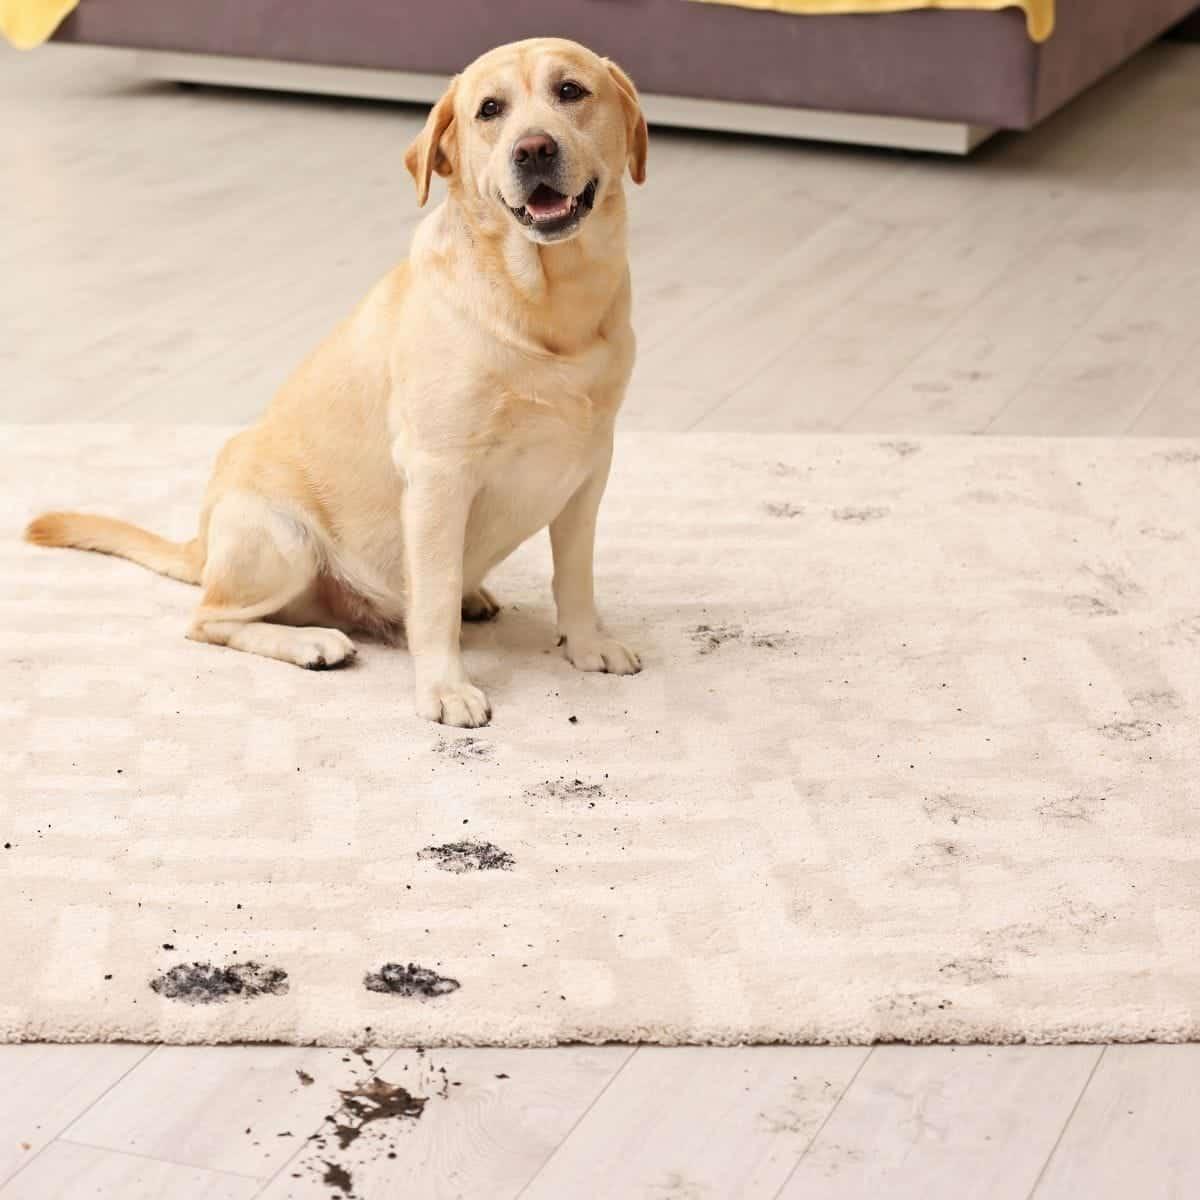 dogs muddy paws